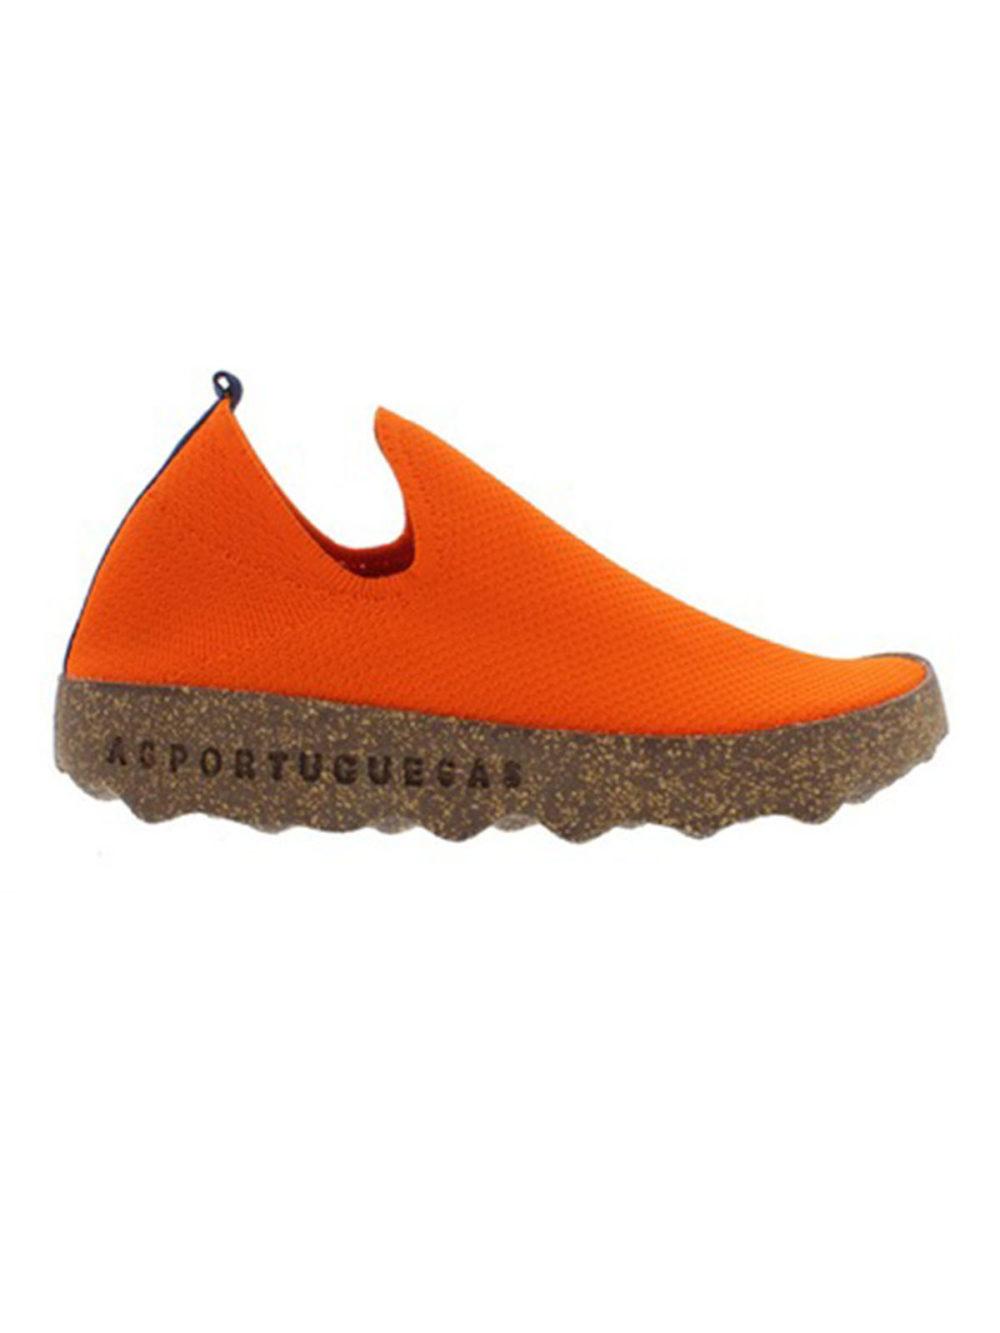 AS Portuguesas Care Shoe Softinos Katie Kerr Women's Shoes